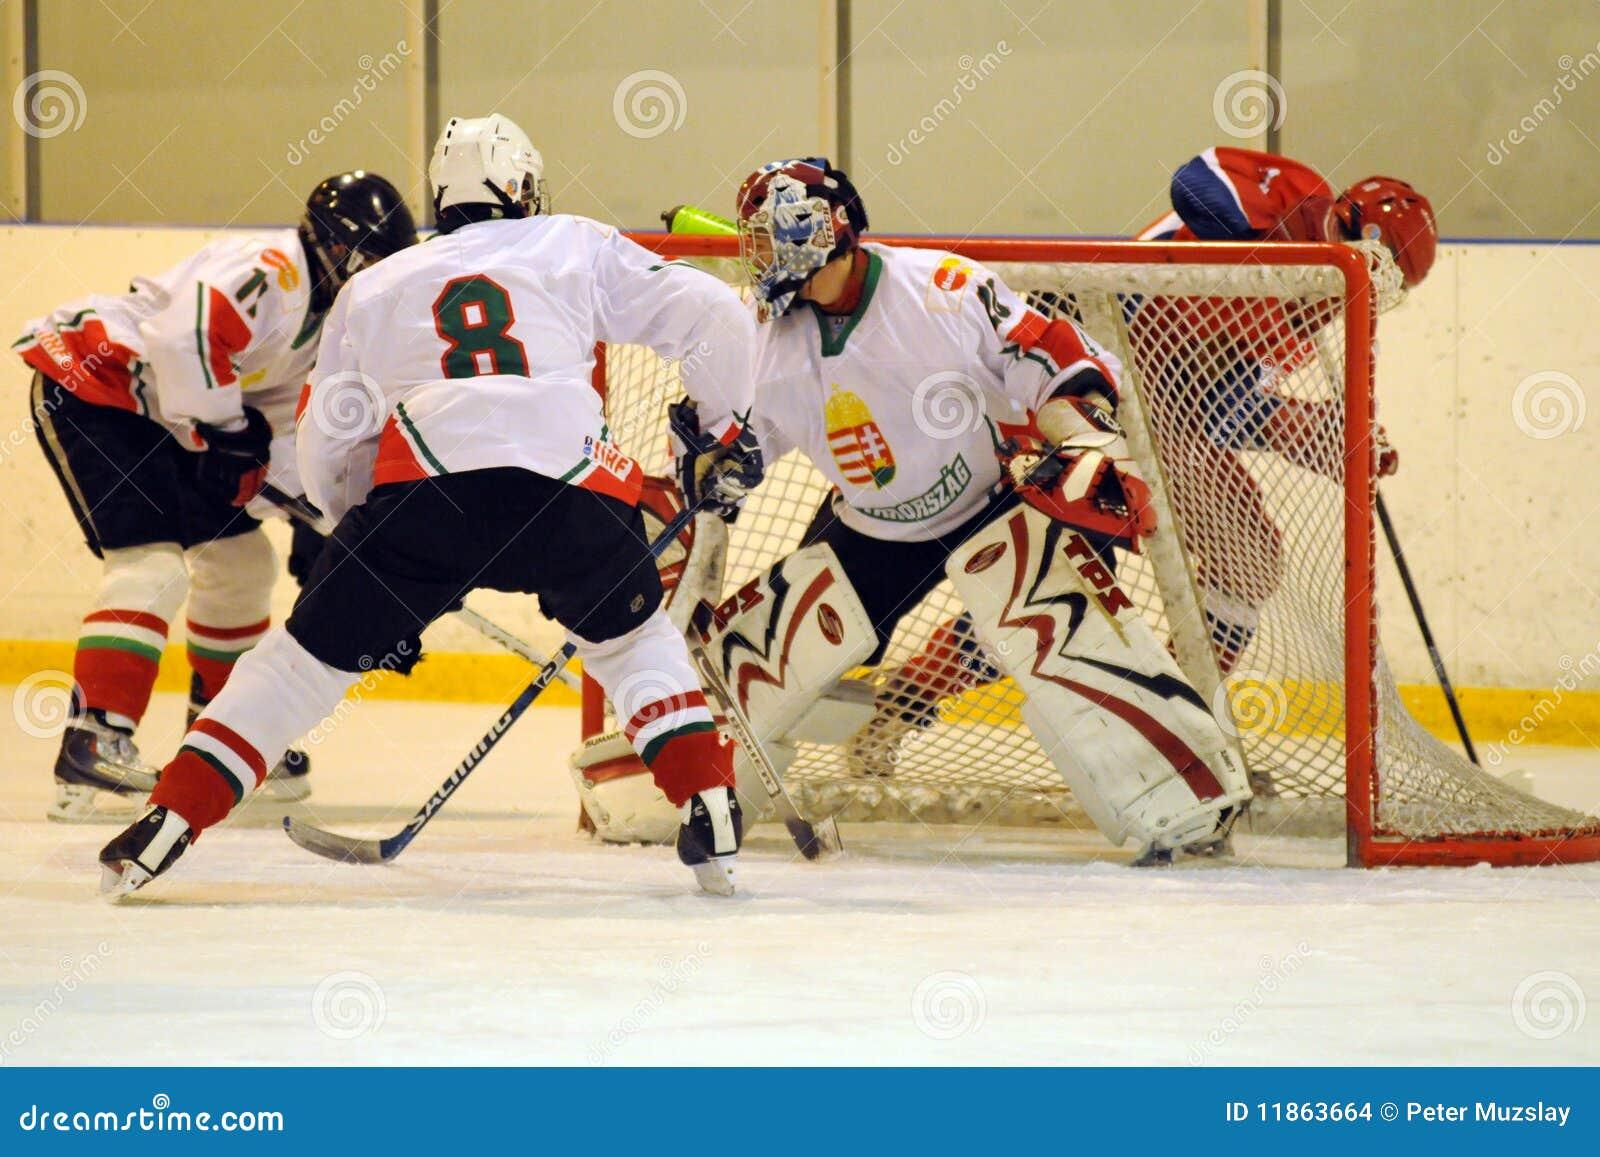 Hungary - Russia youth national ice-hockey match